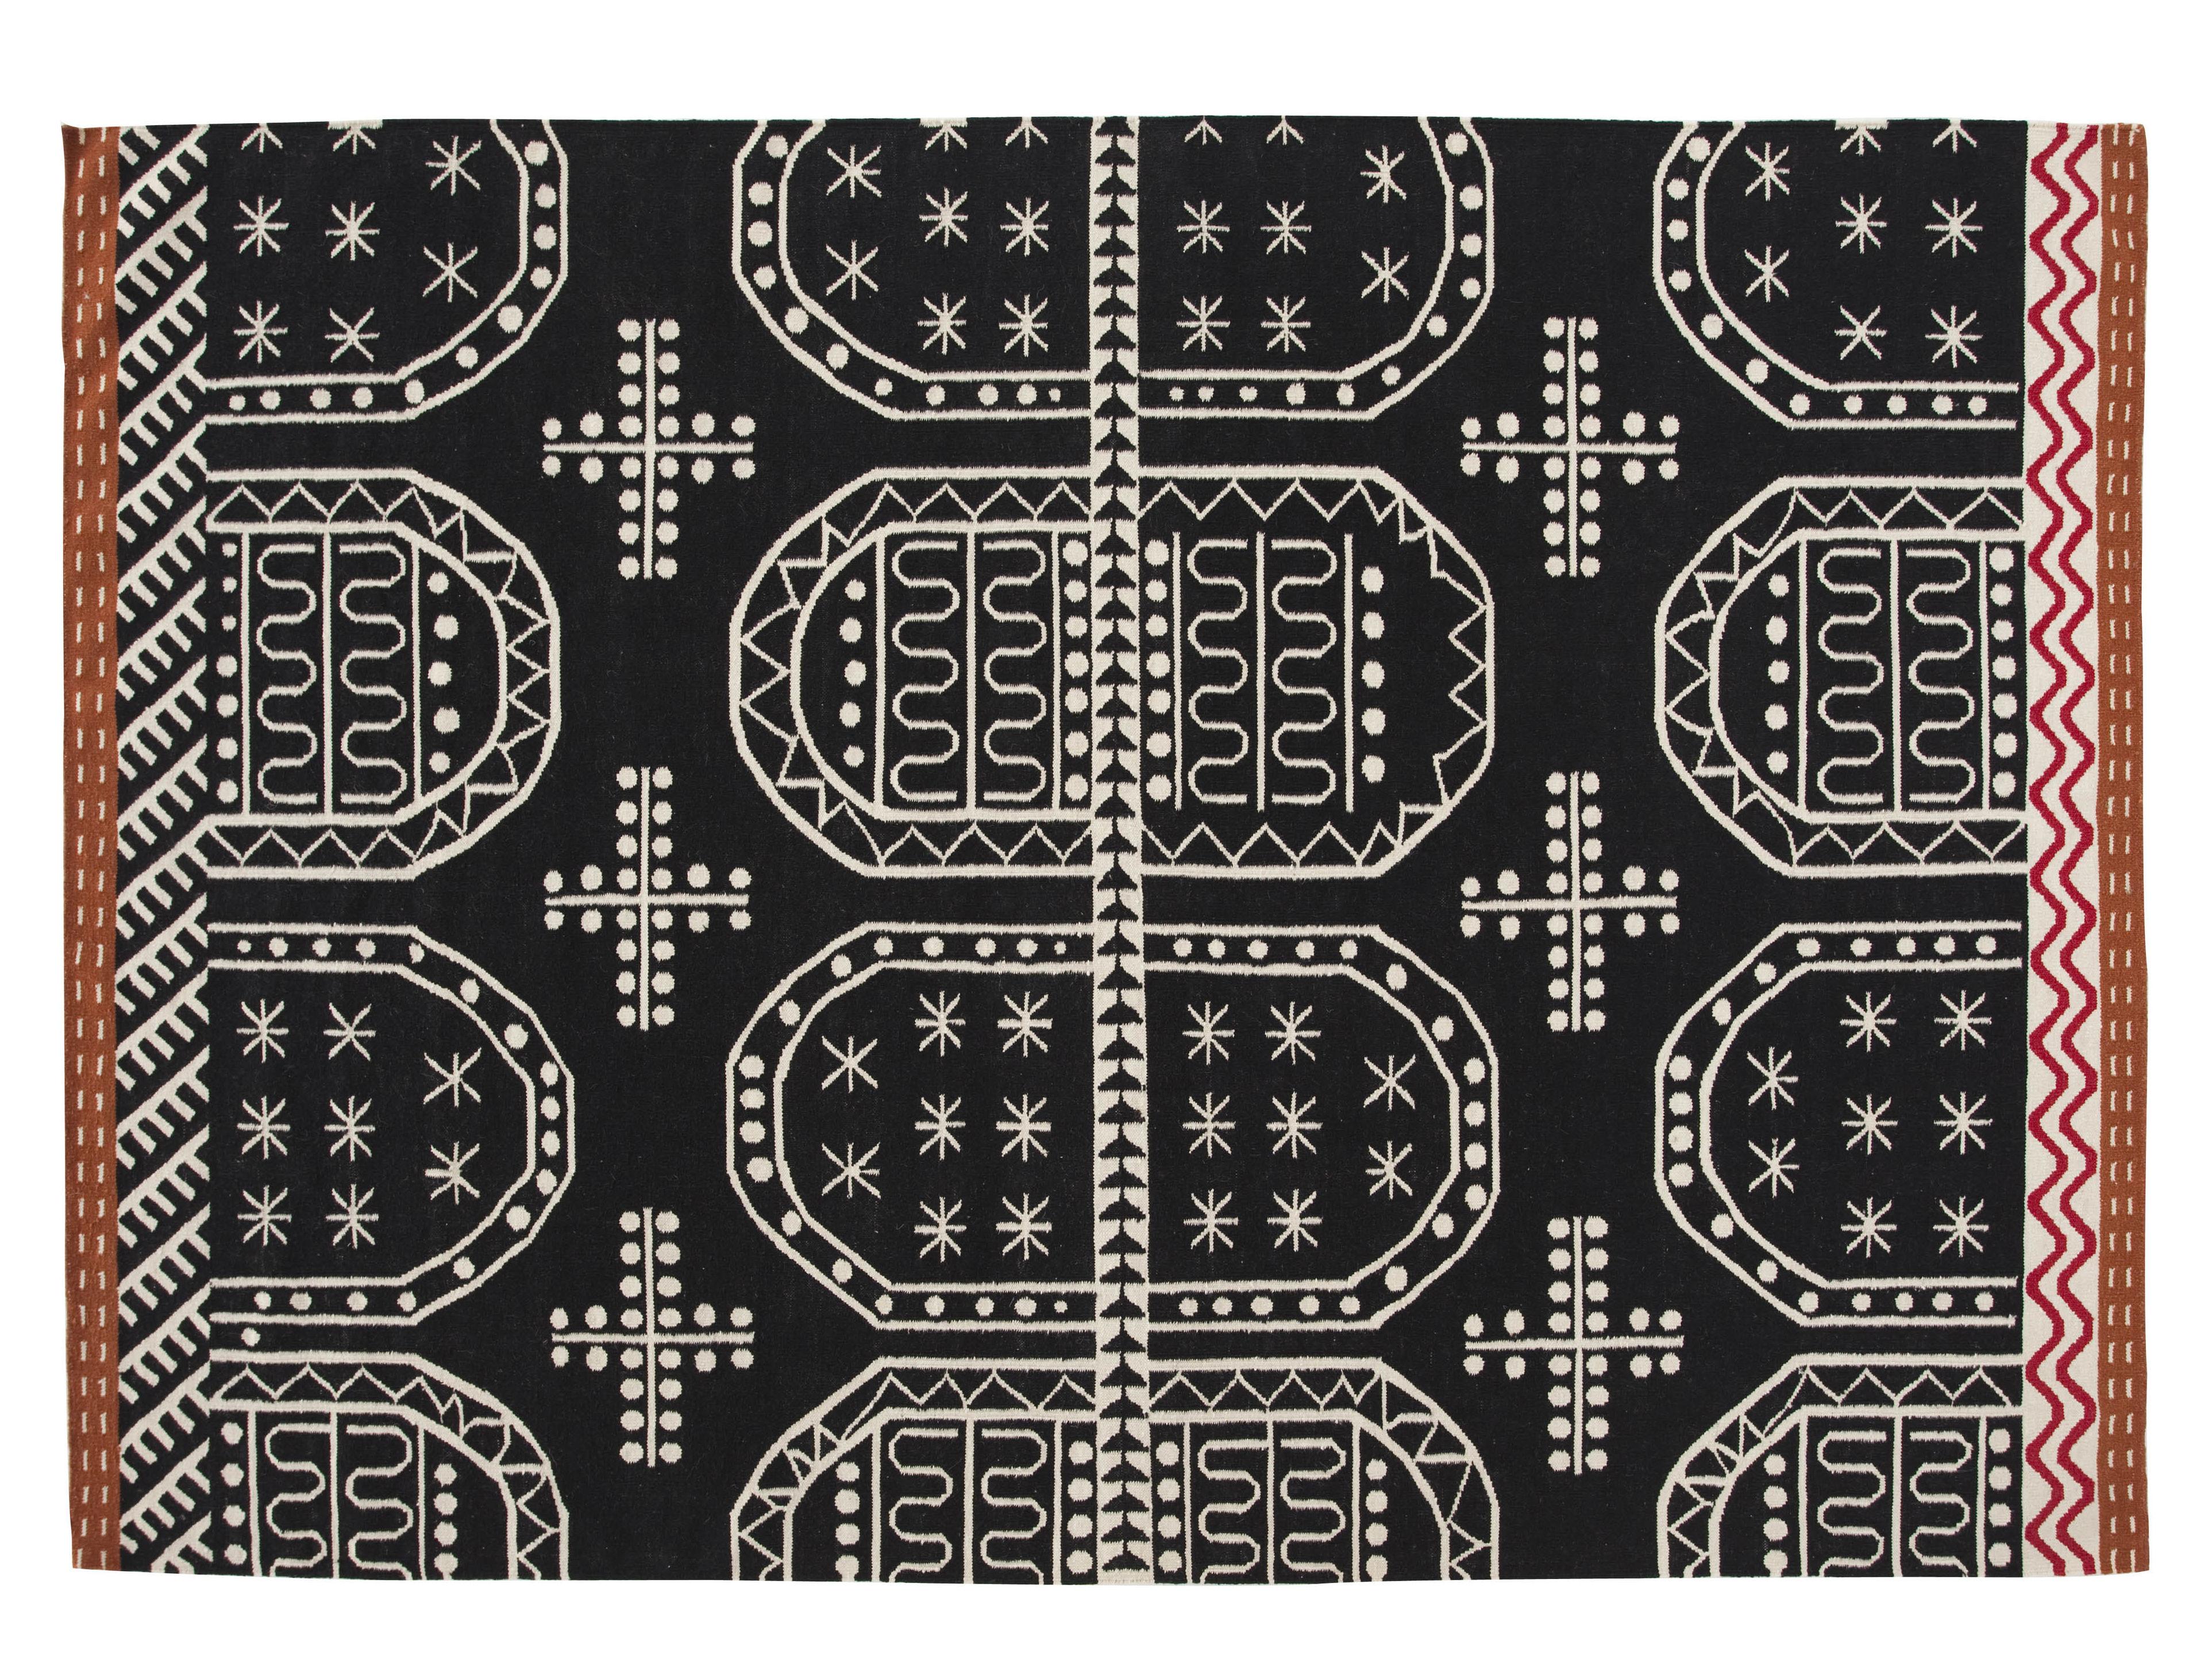 tapis kilim tasili 240 x 170 cm noir gan. Black Bedroom Furniture Sets. Home Design Ideas